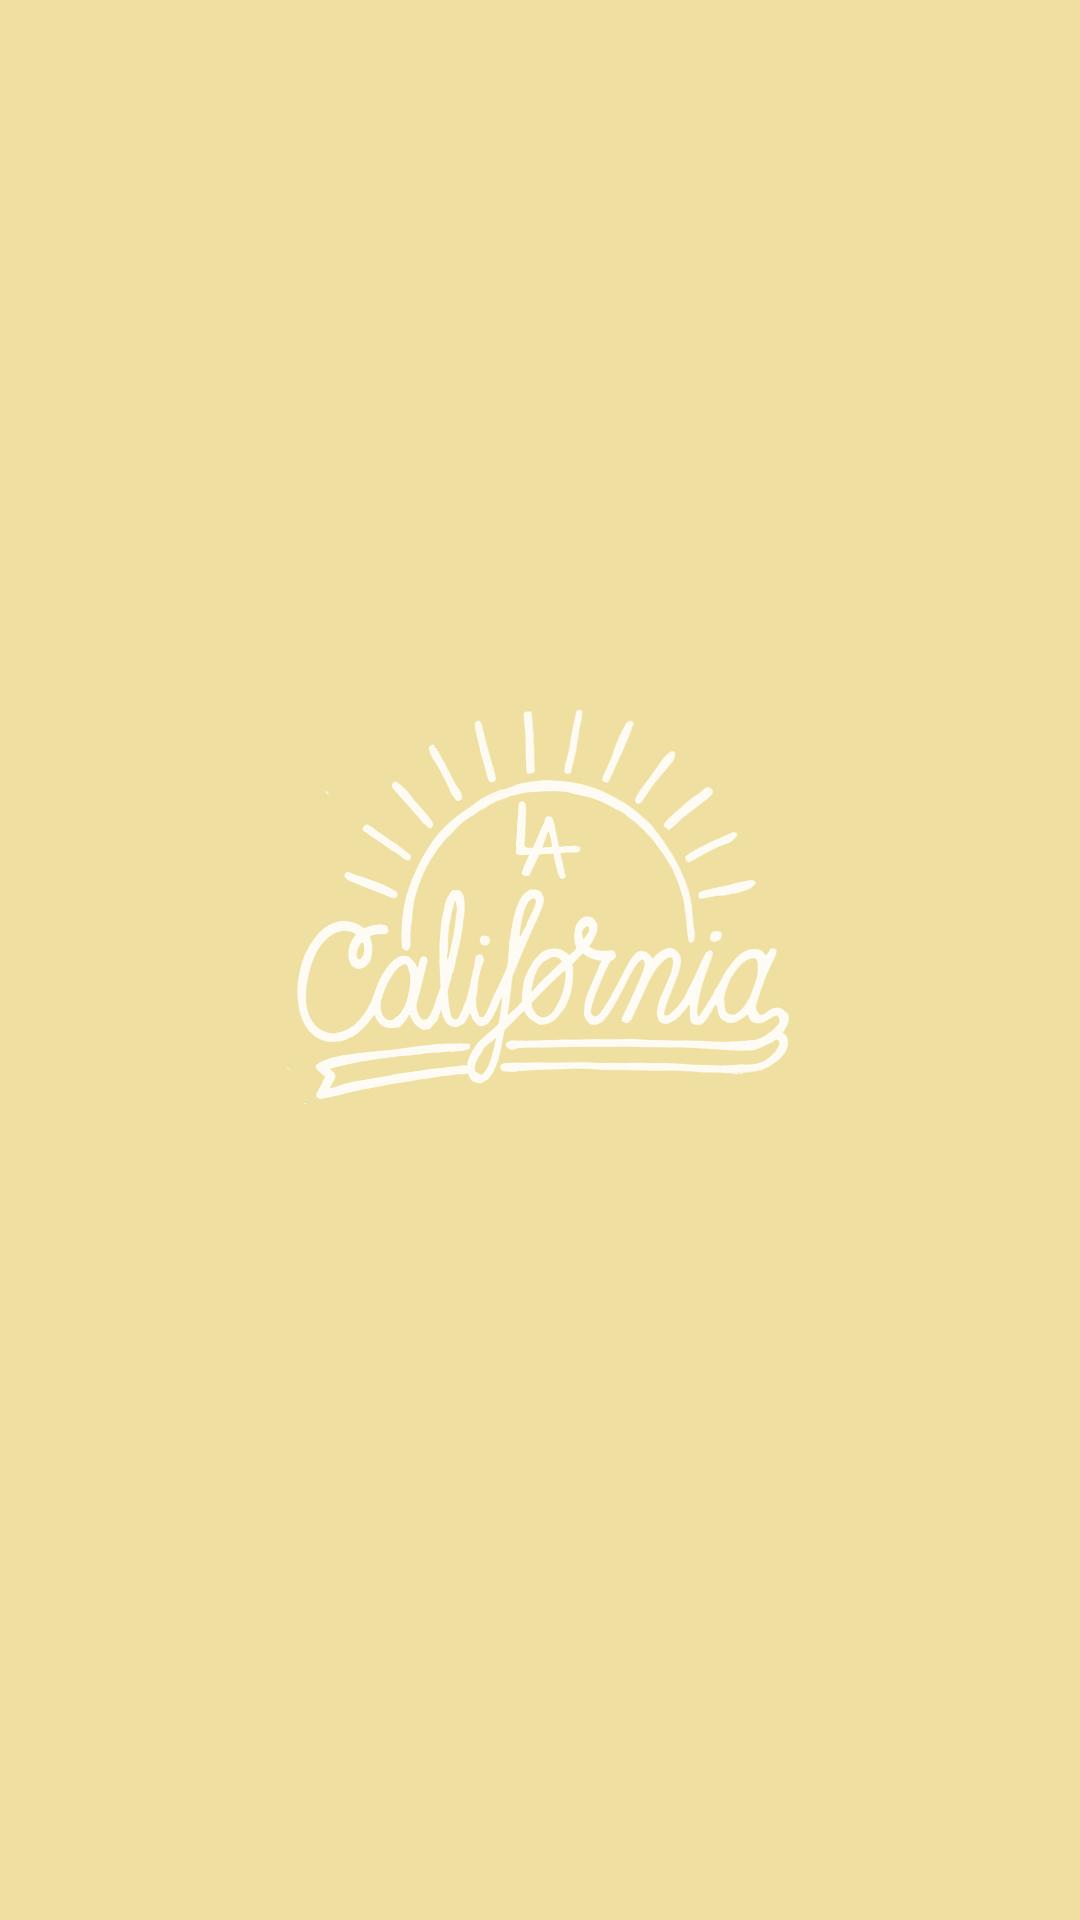 Phone Background Wallpaper California Type Lettering Wallpaper Iphone Summer California Wallpaper California Iphone Wallpaper